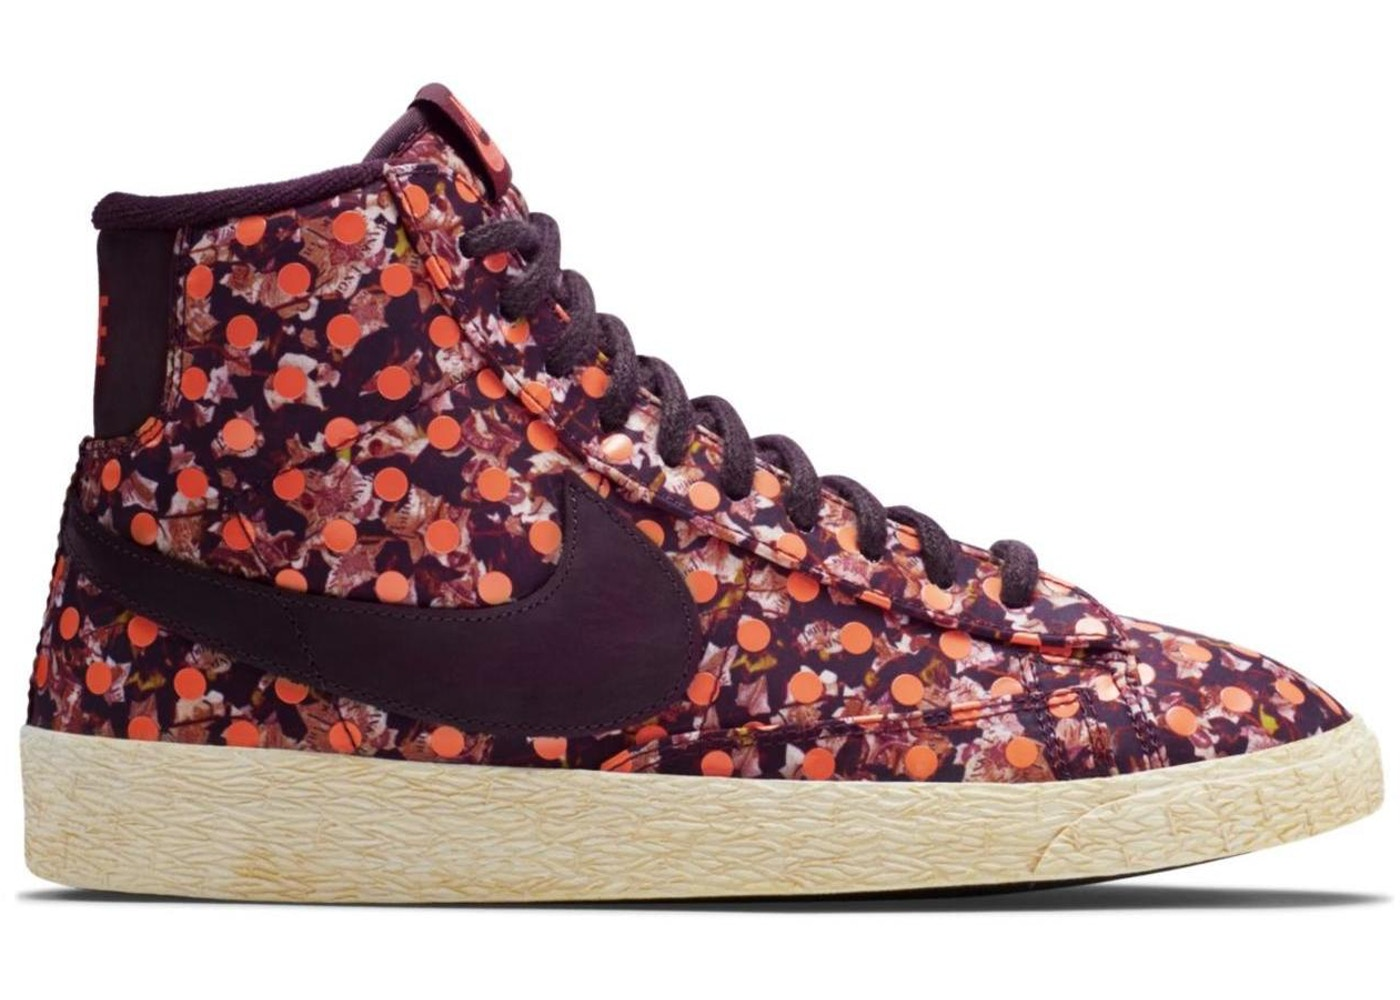 hot sale online bf447 c2710 Nike SB Blazer Liberty Burgundy (GS) - 529037-600